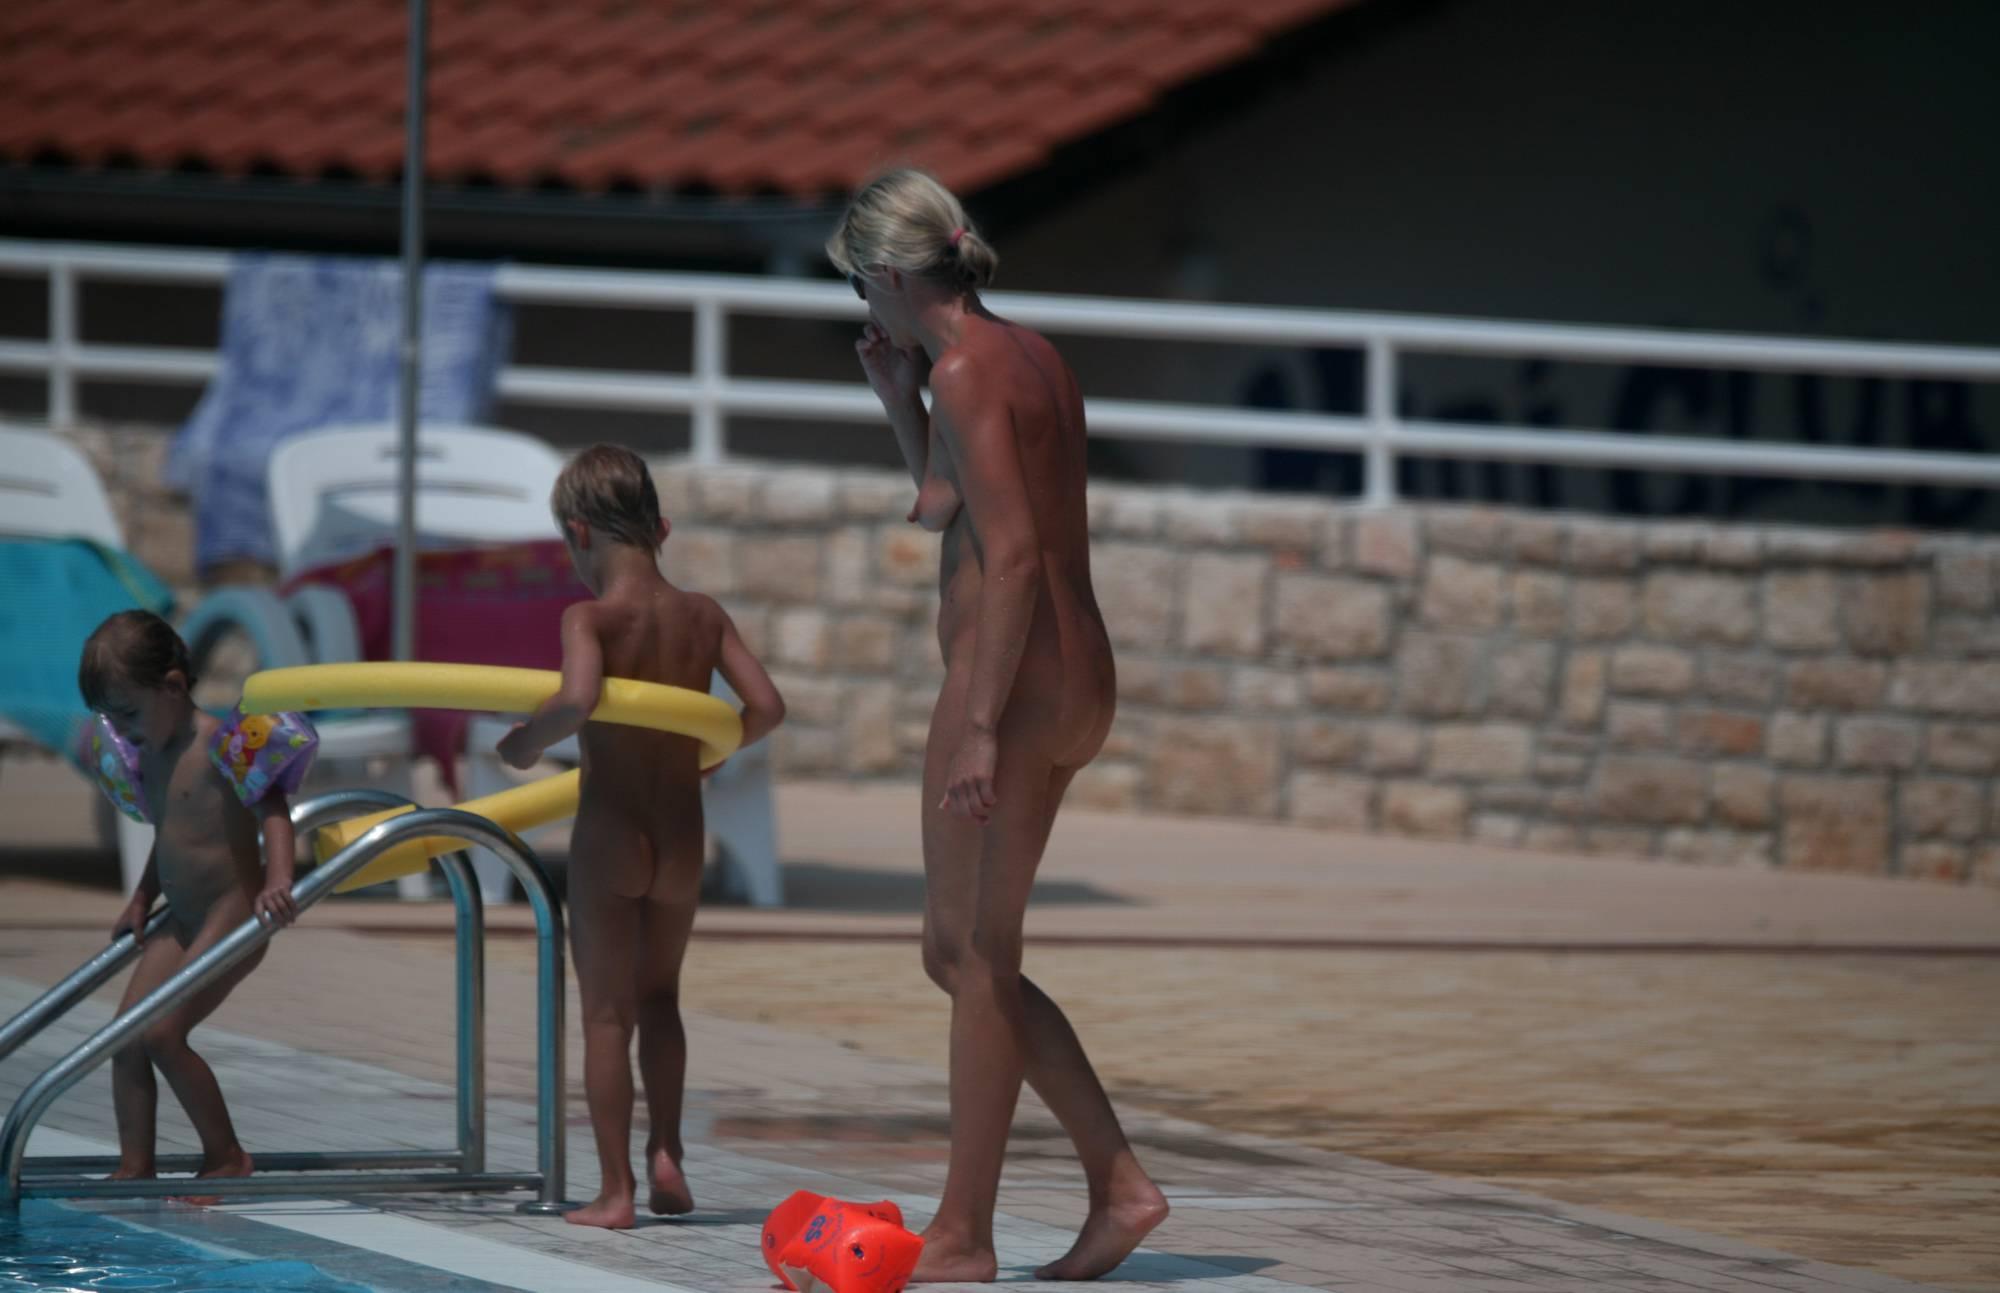 Naturist Poolside Families - 3